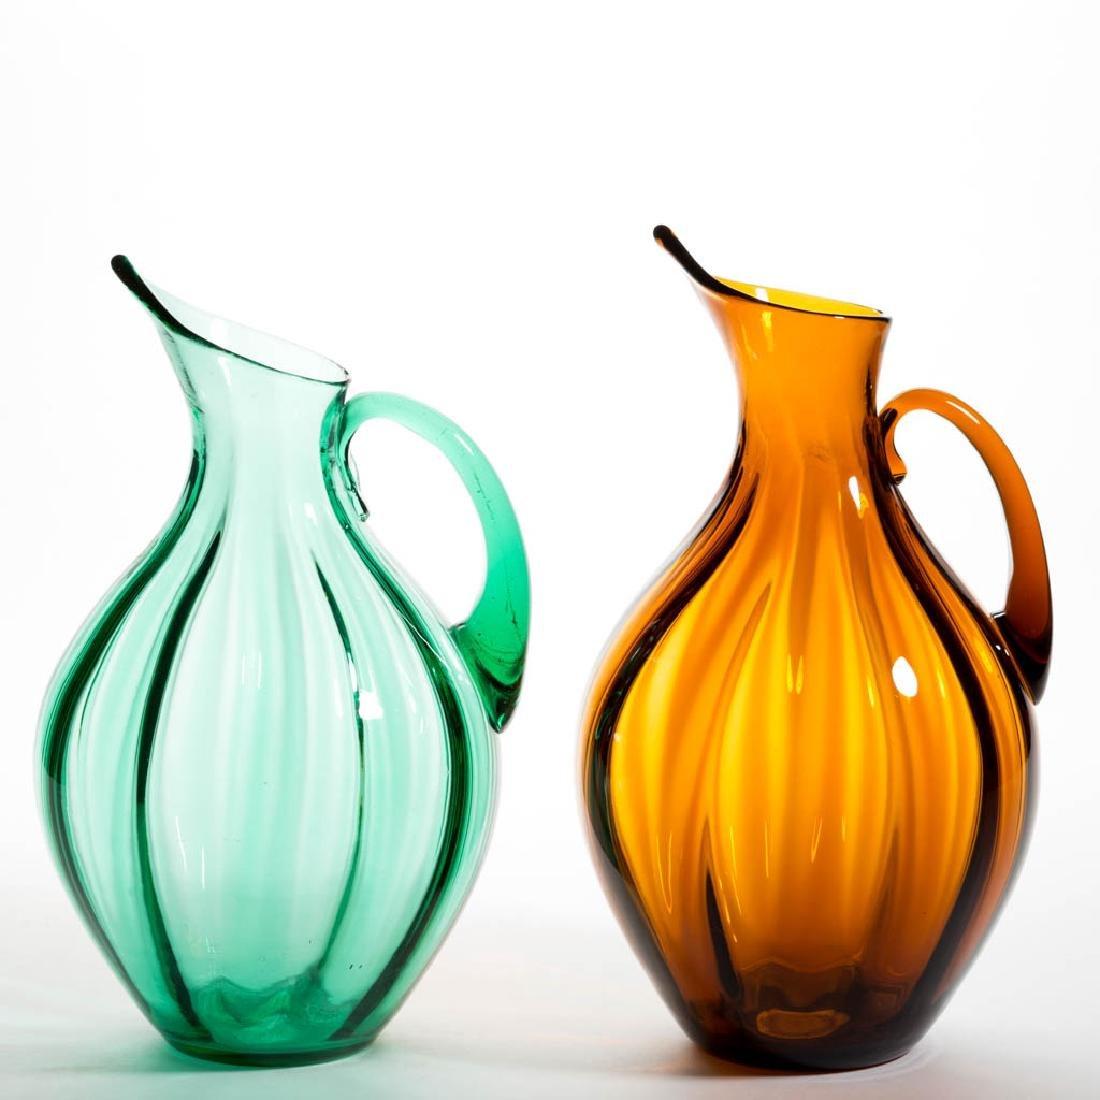 BLENKO NO. 991 GLASS - WINSLOW ANDERSON PITCHERS, LOT